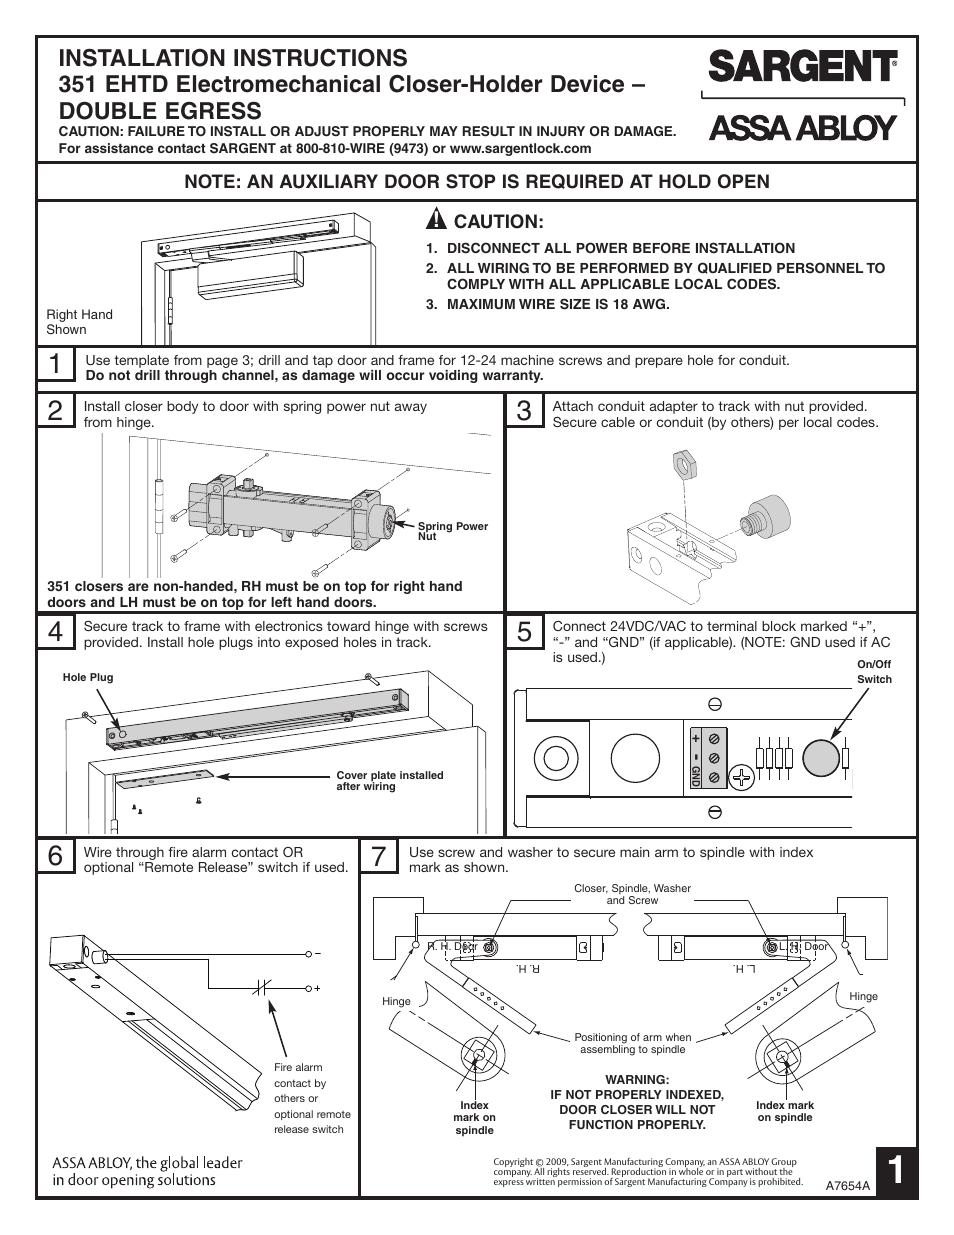 Sargent 351 Eht Ehtd Electromechanical Closer Holder User Manual 3 Htd Wiring Diagram Pages